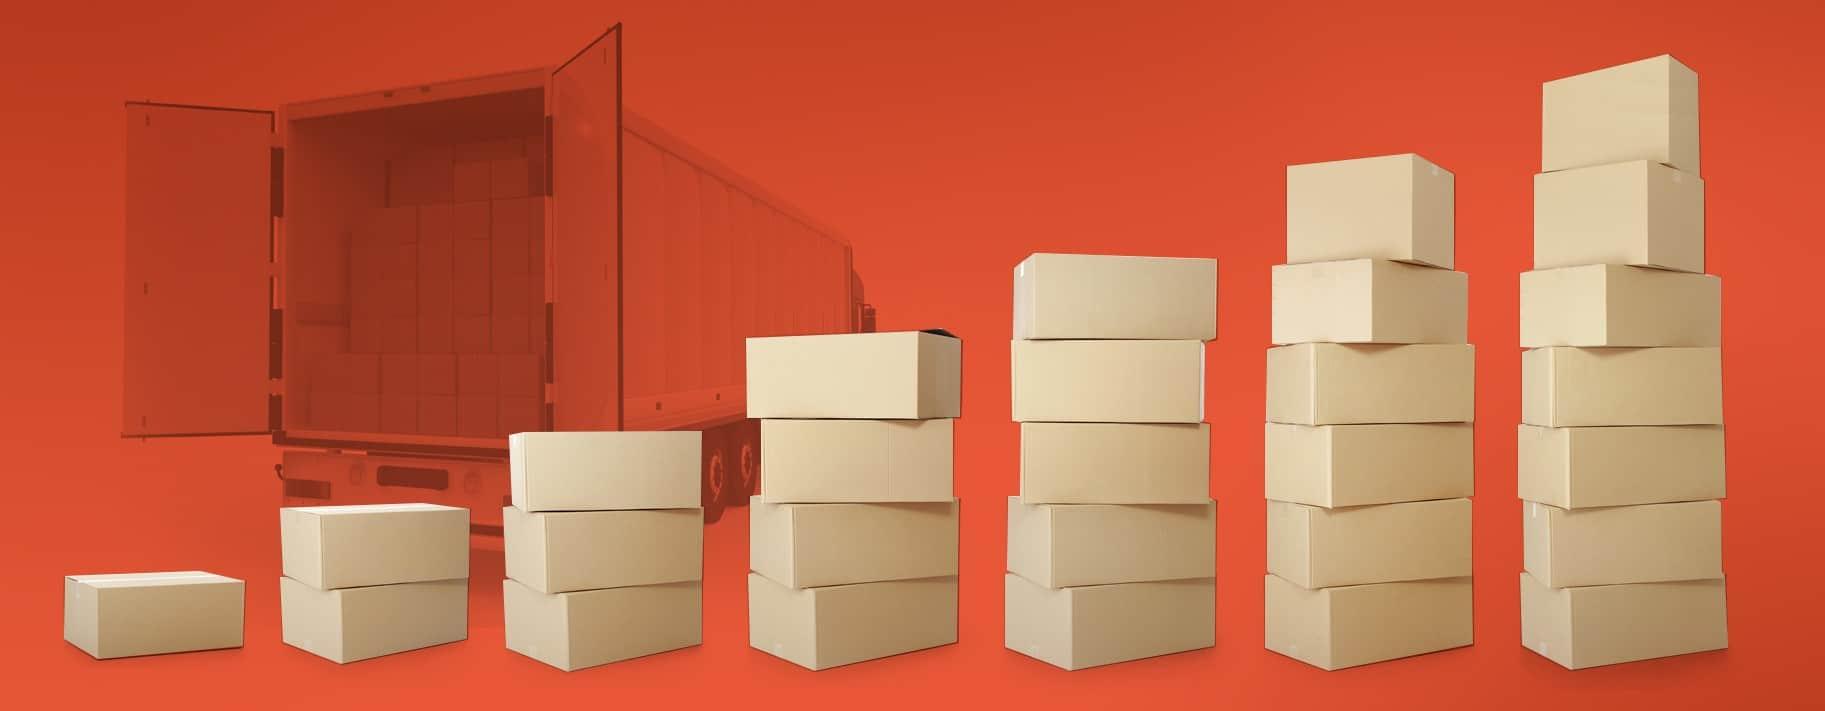 understanding LTL freight consolidation